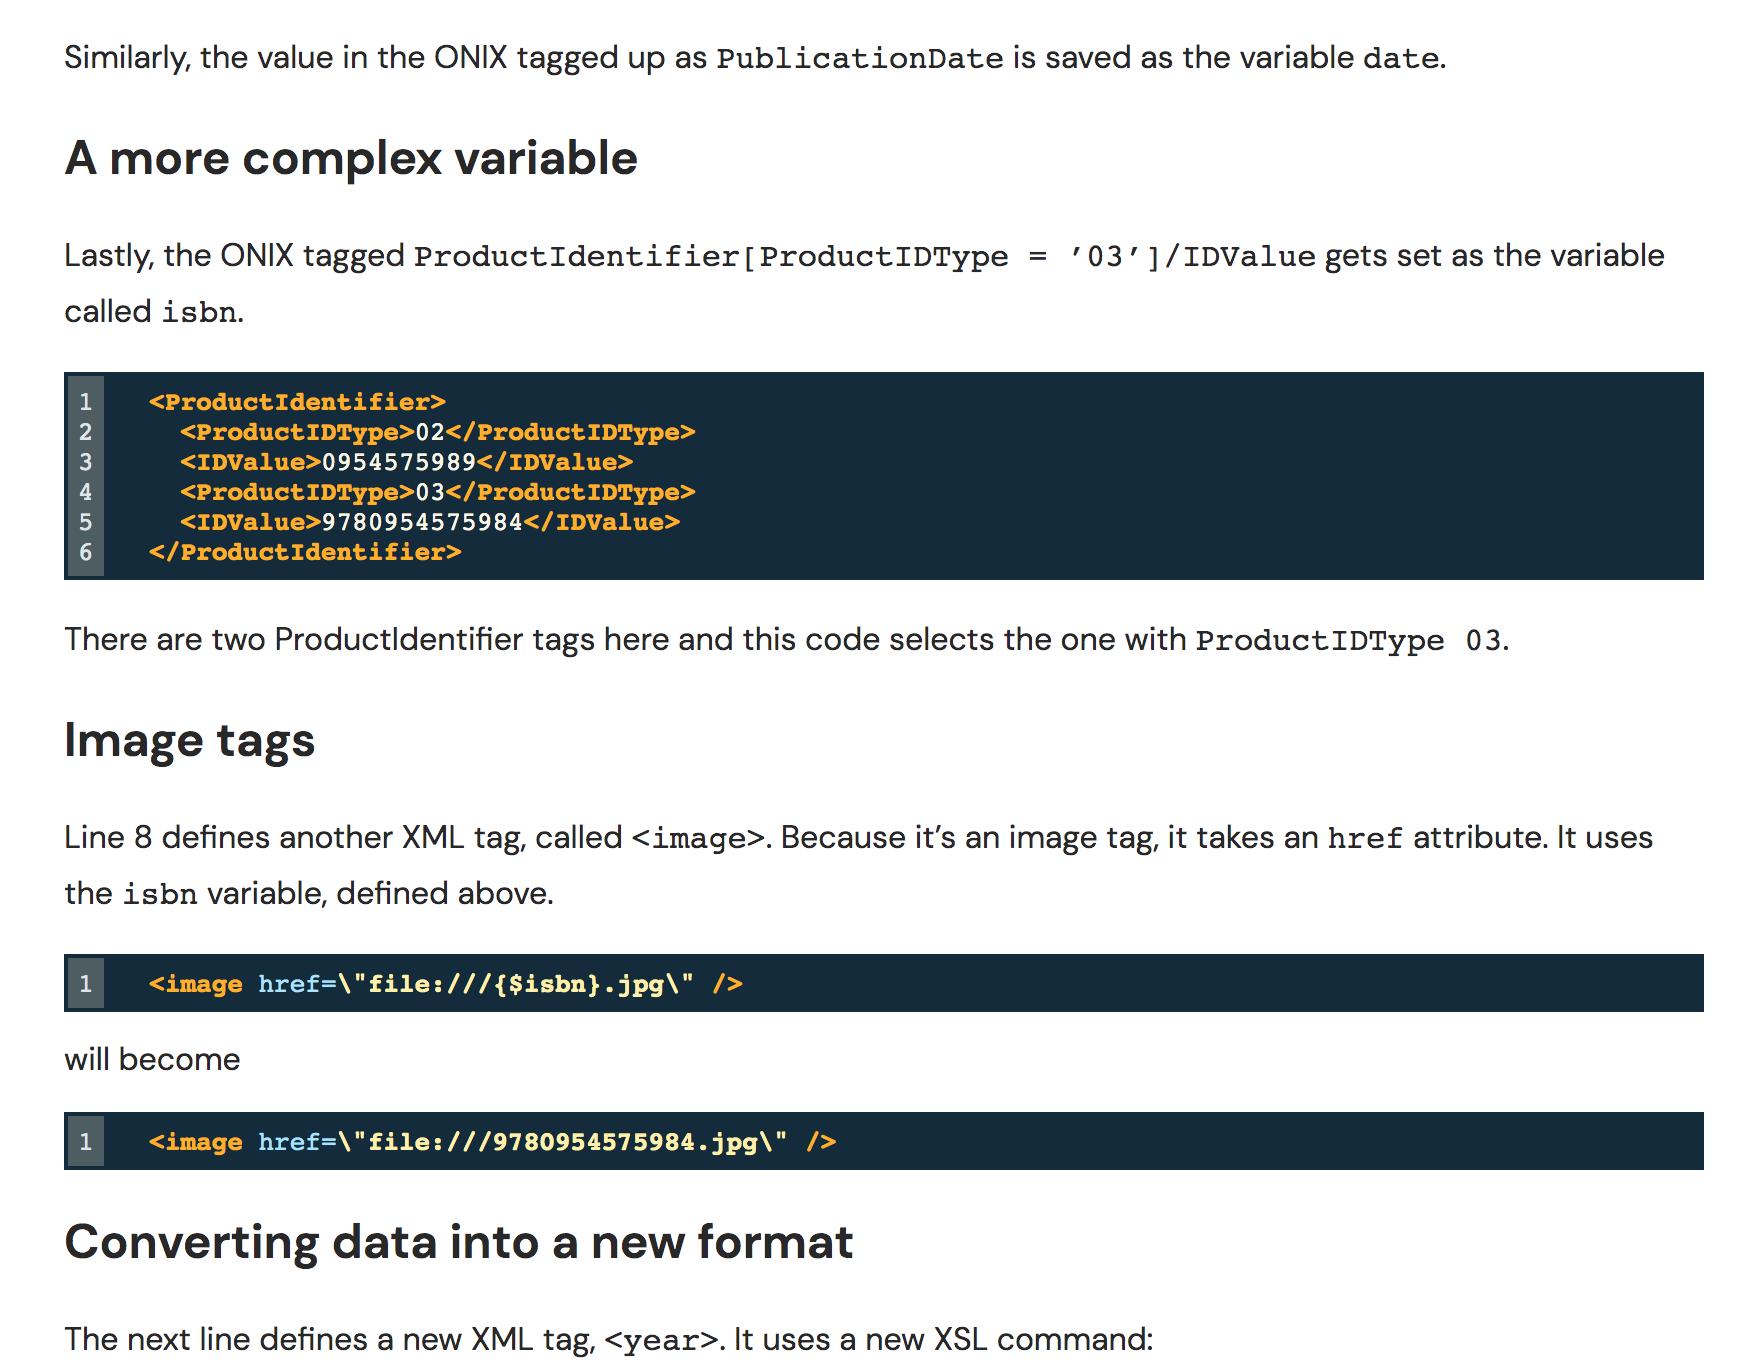 Catalogues in InDesign via ONIX screenshot